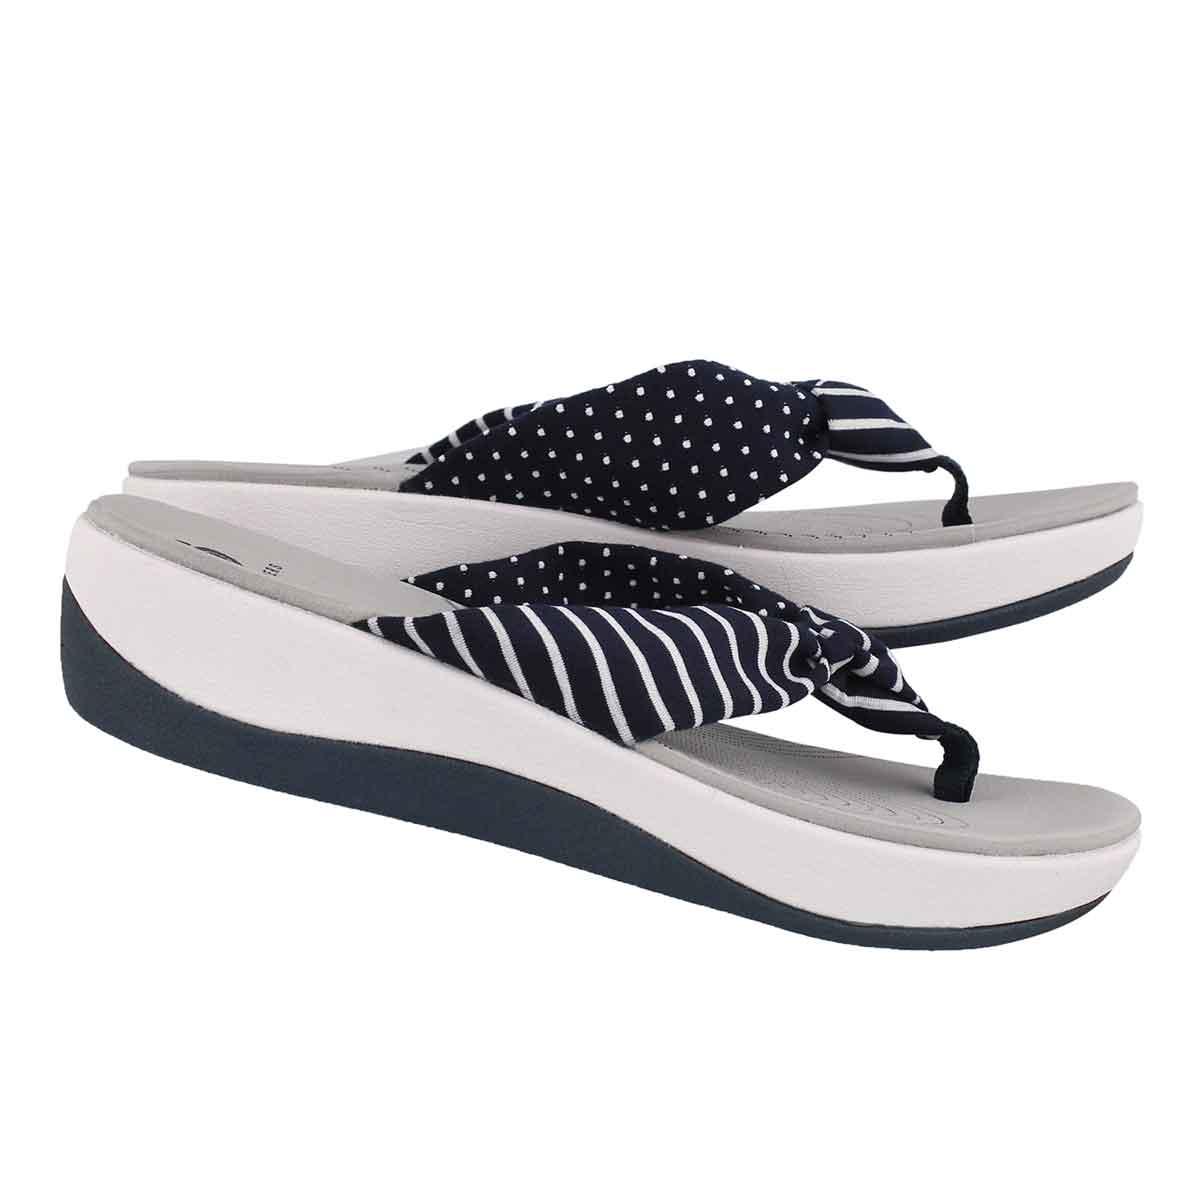 Lds Arla Glison nvy prnt wedge sandal